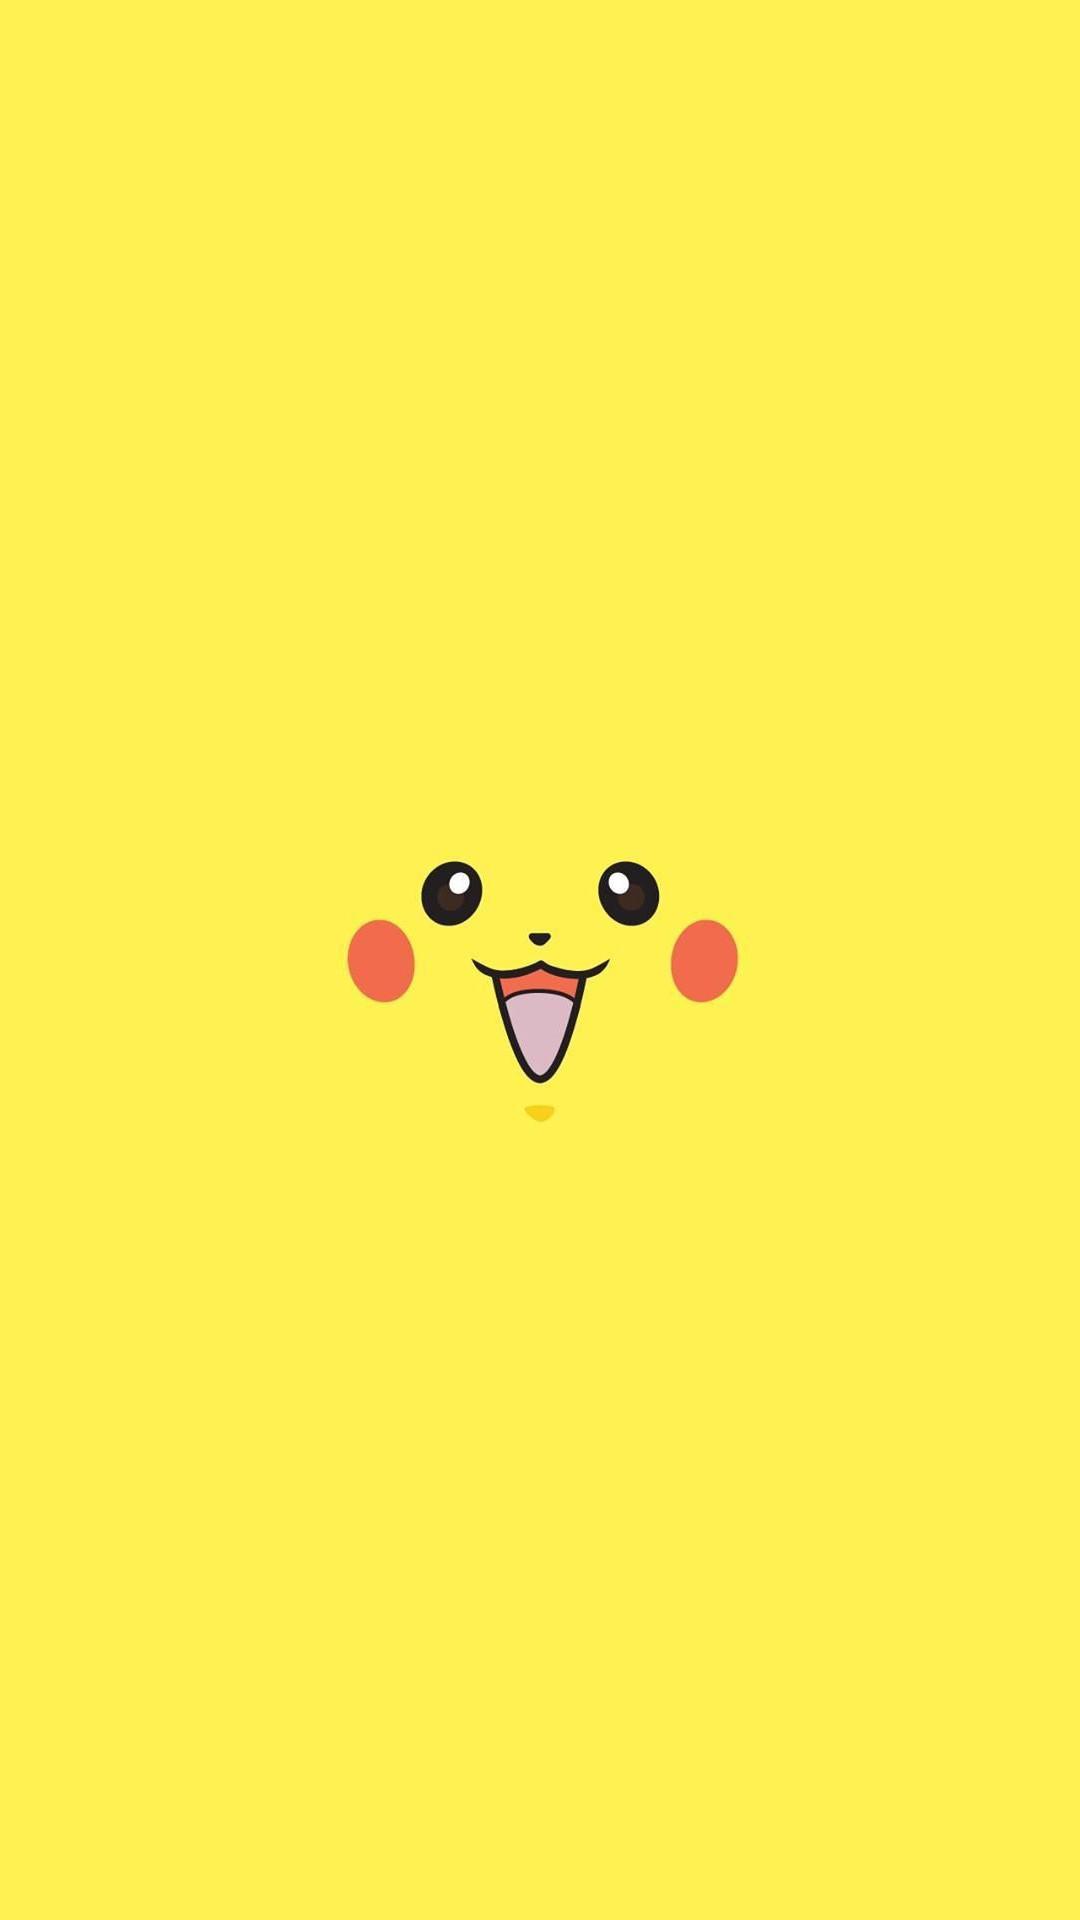 Pikachu Pokemon Minimal Flat iPhone 8 wallpaper